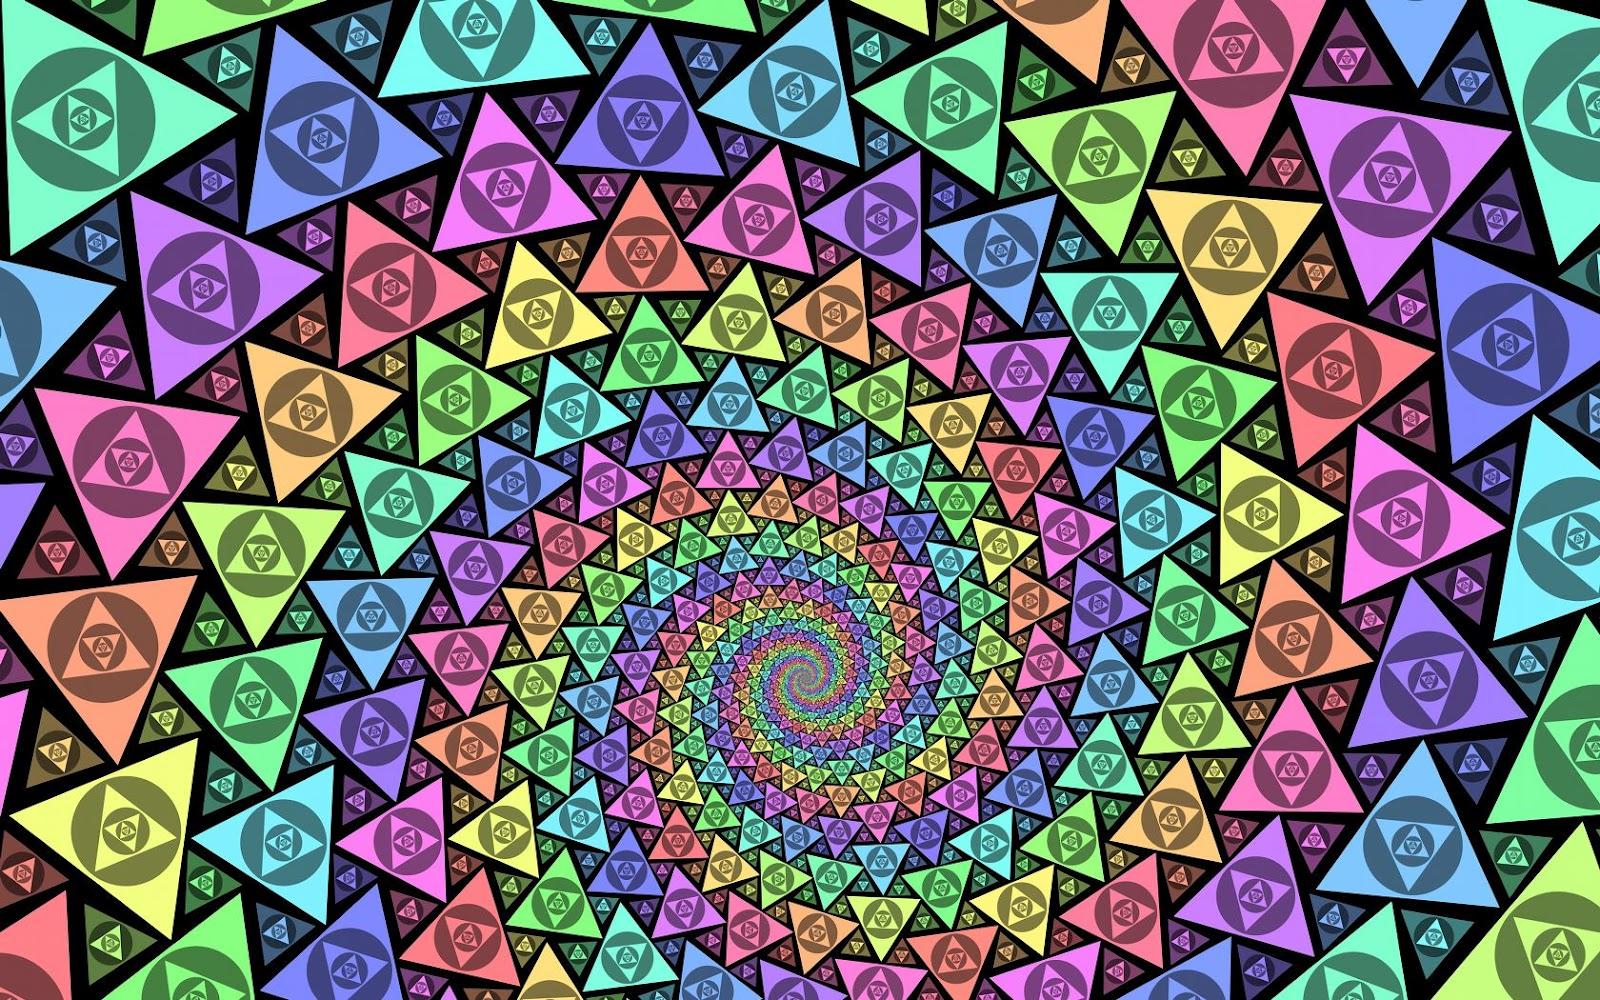 http://2.bp.blogspot.com/-kBZKLDM4HL8/T7G0LYCQ2aI/AAAAAAAACNQ/wq3ebjqkP1Y/s1600/psychedelic-wallpaper-vortex.jpg